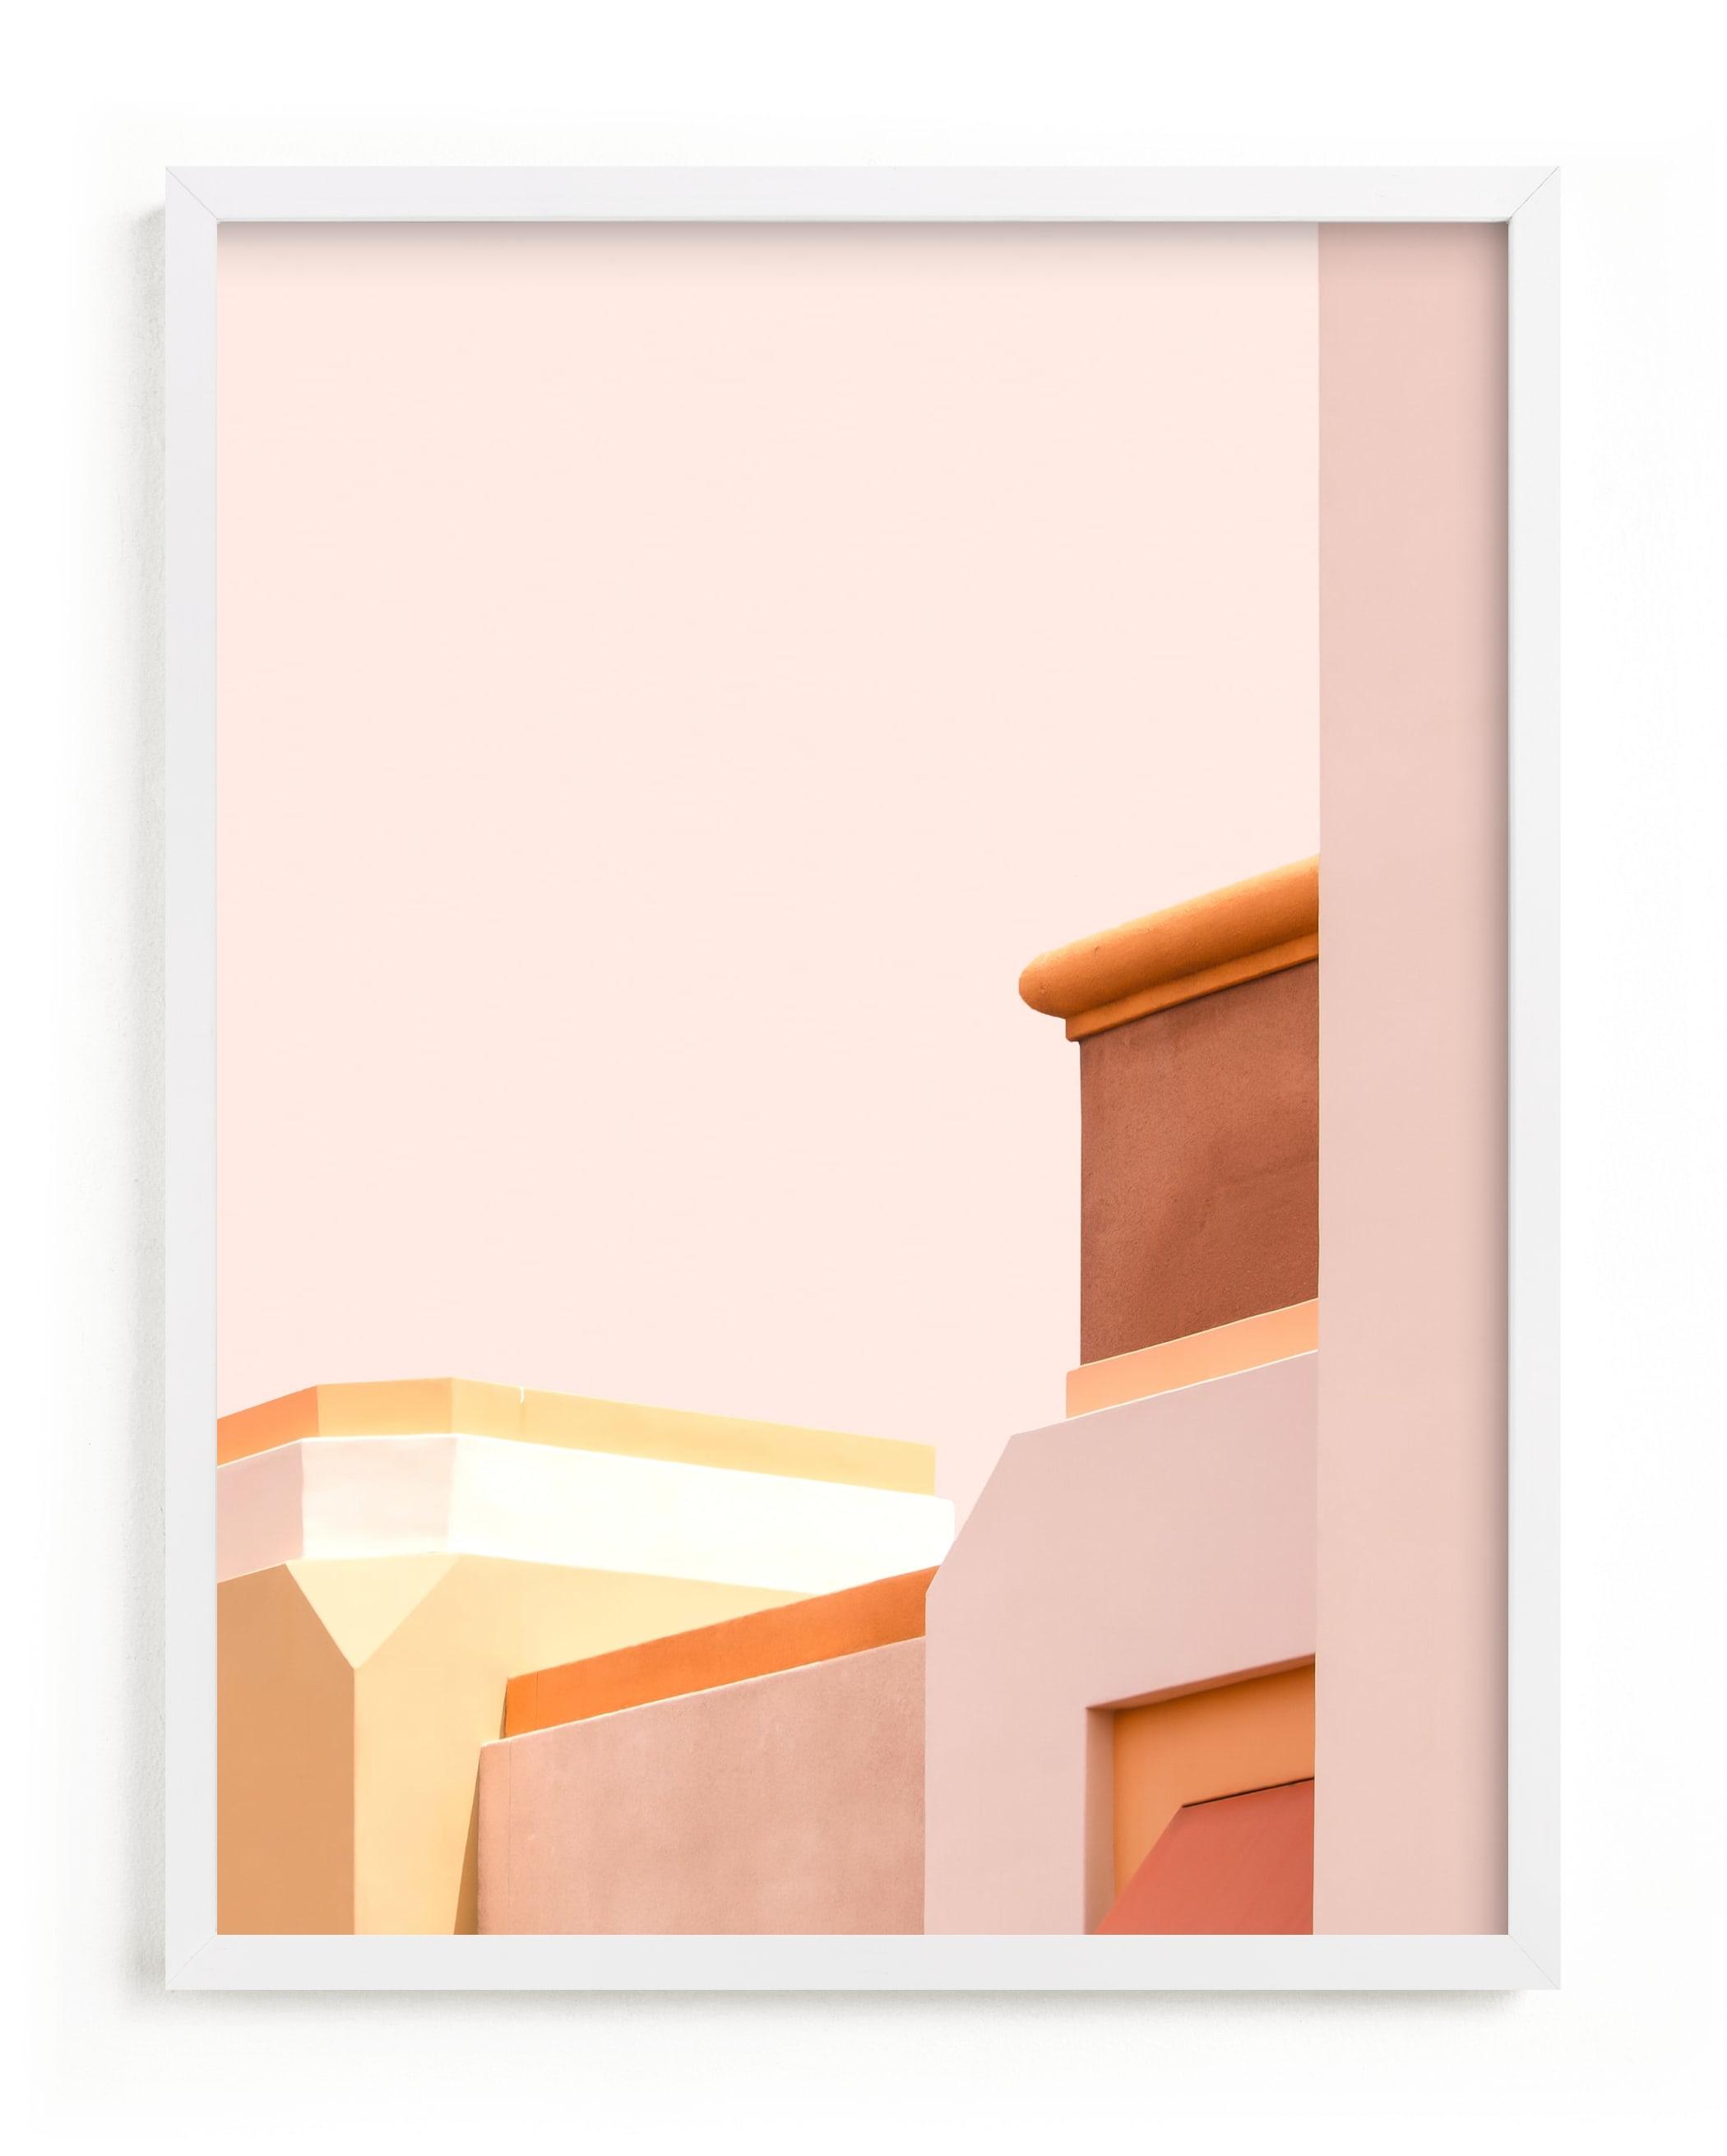 This is a pink art by Lisa Sundin called Urban Desert Series 1.